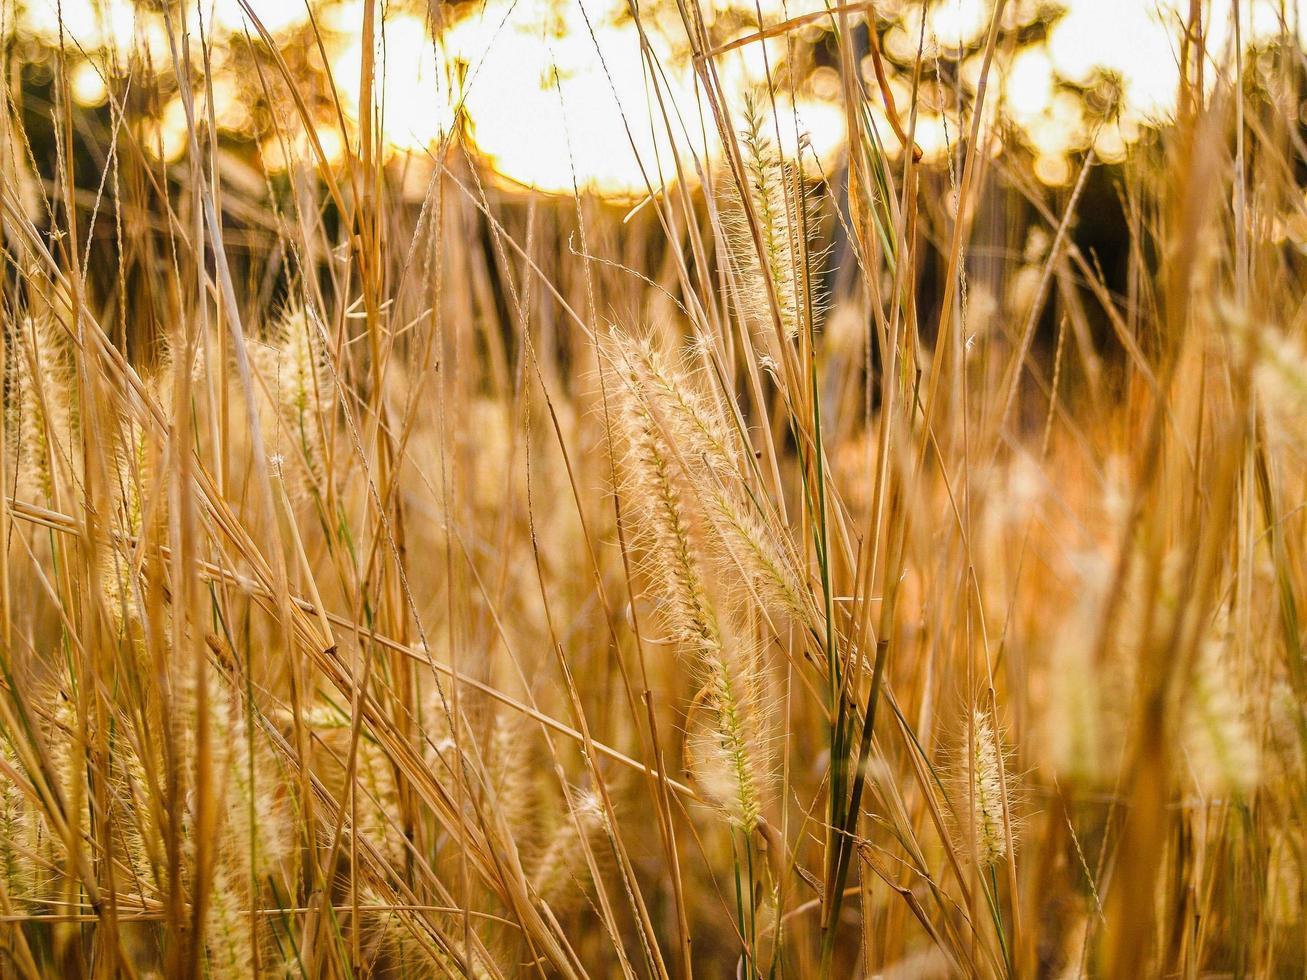 goldenes Weizenfeld foto